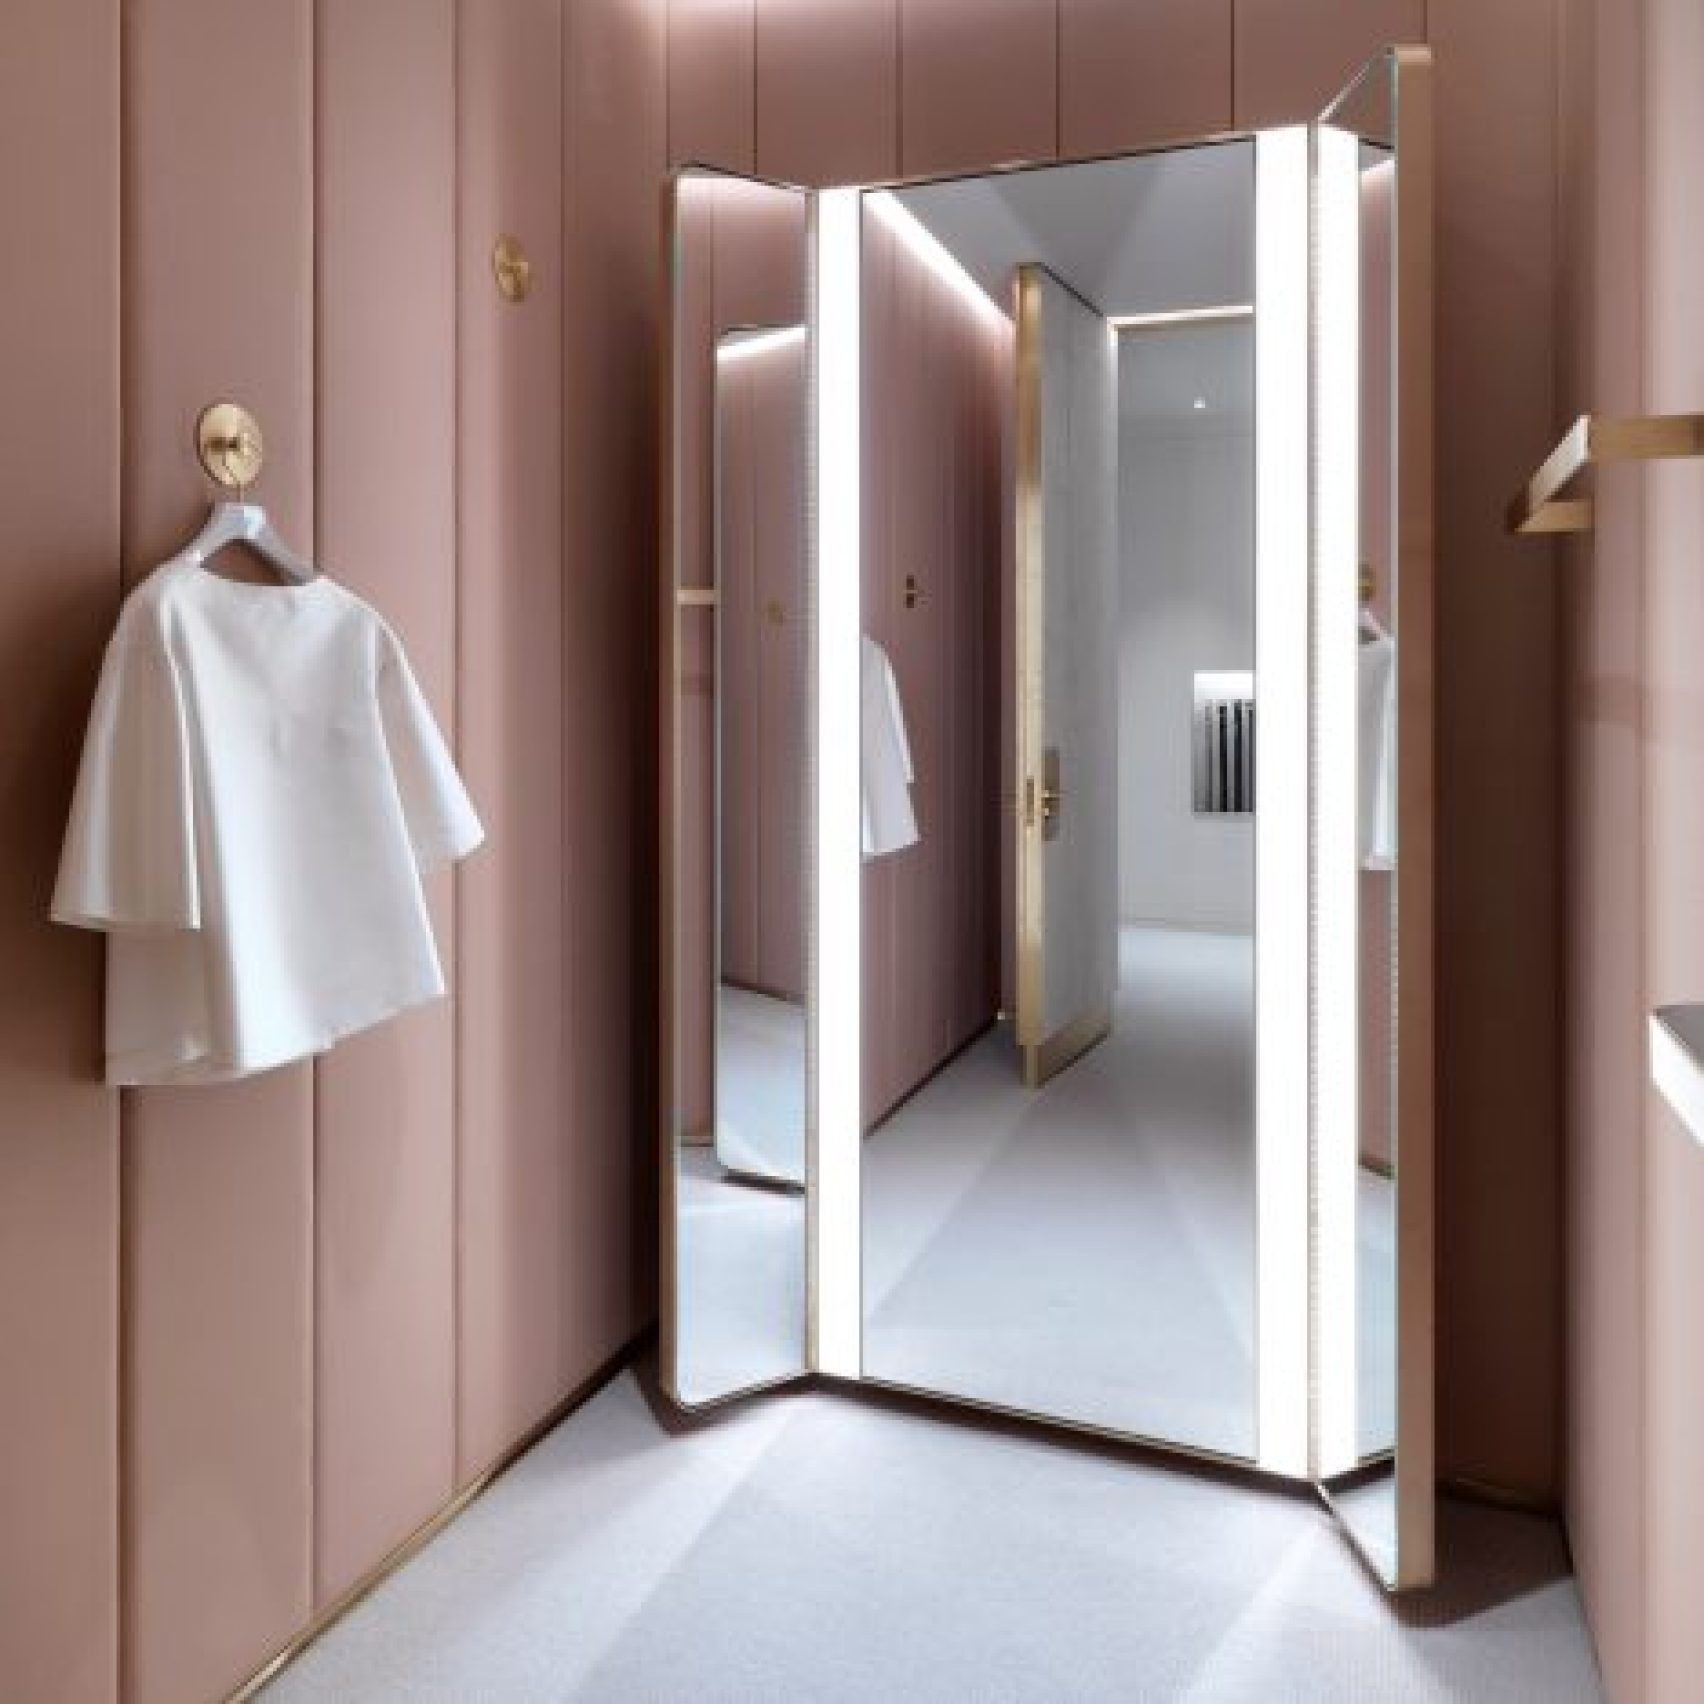 j-m-davidson-store-universal-design-studio-col